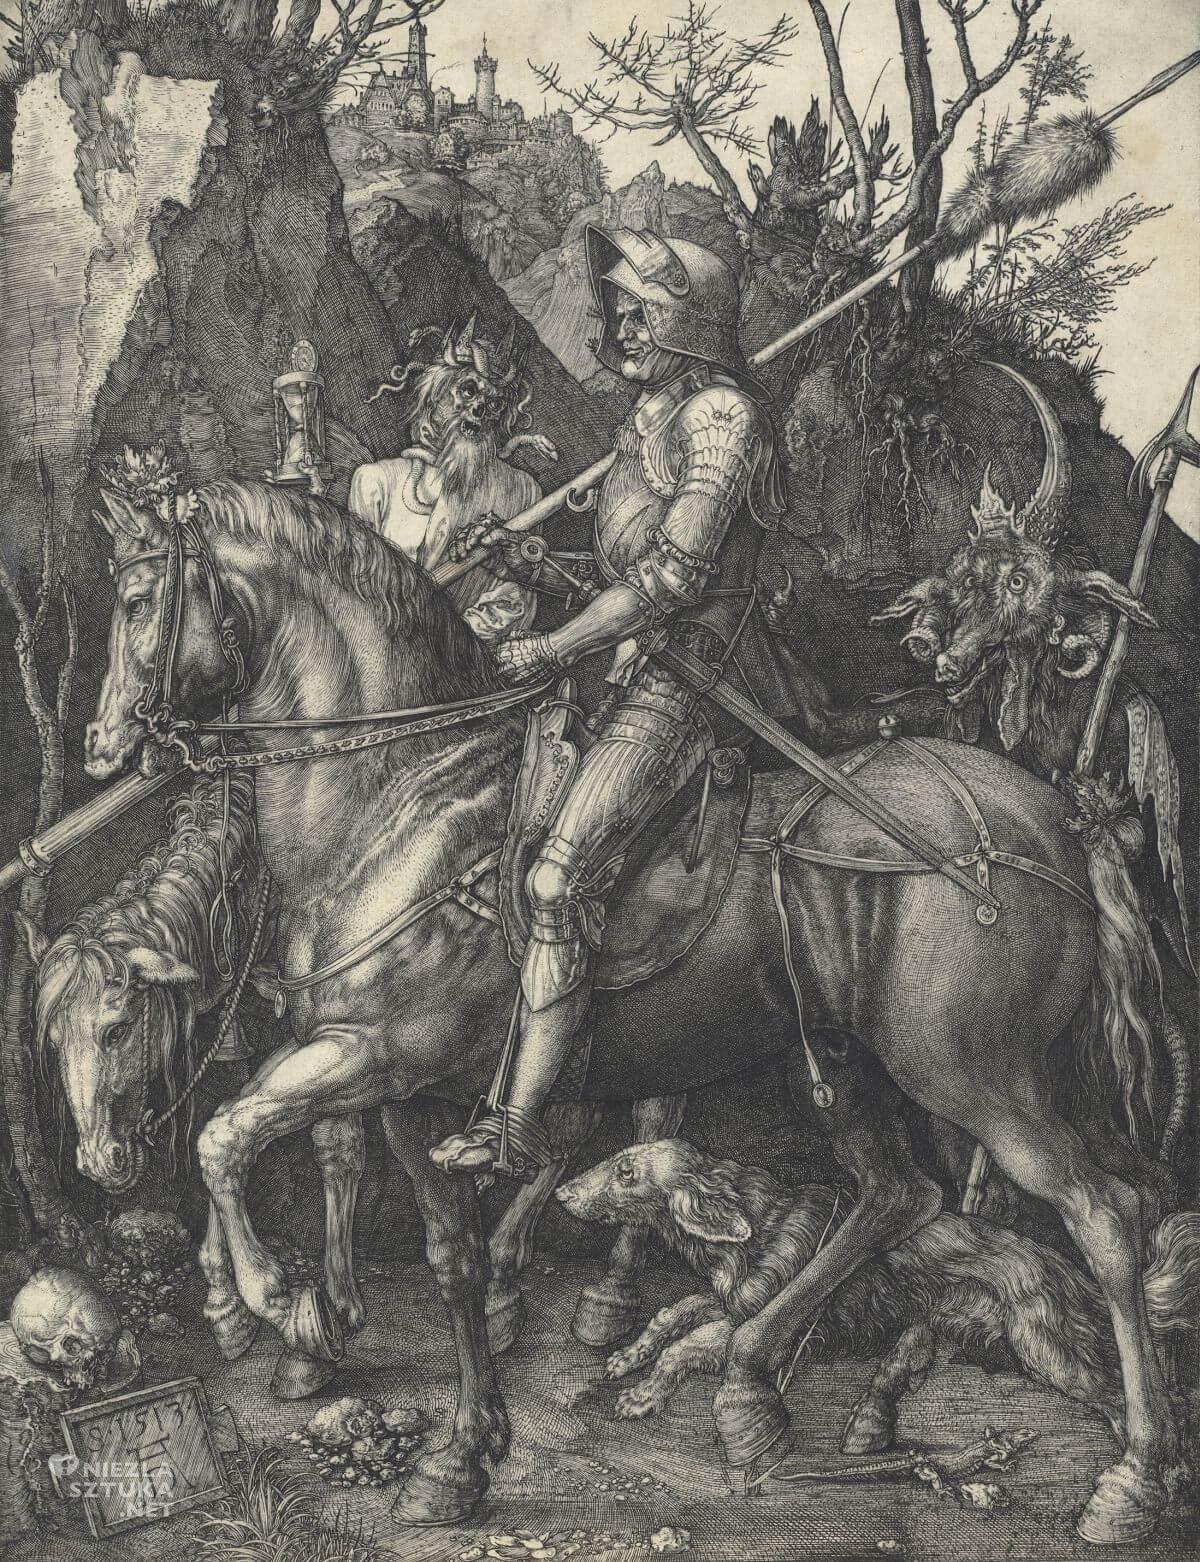 Albrecht Durer, Rycerz, śmierć i diabeł, drzeworyt, Niezła sztuka